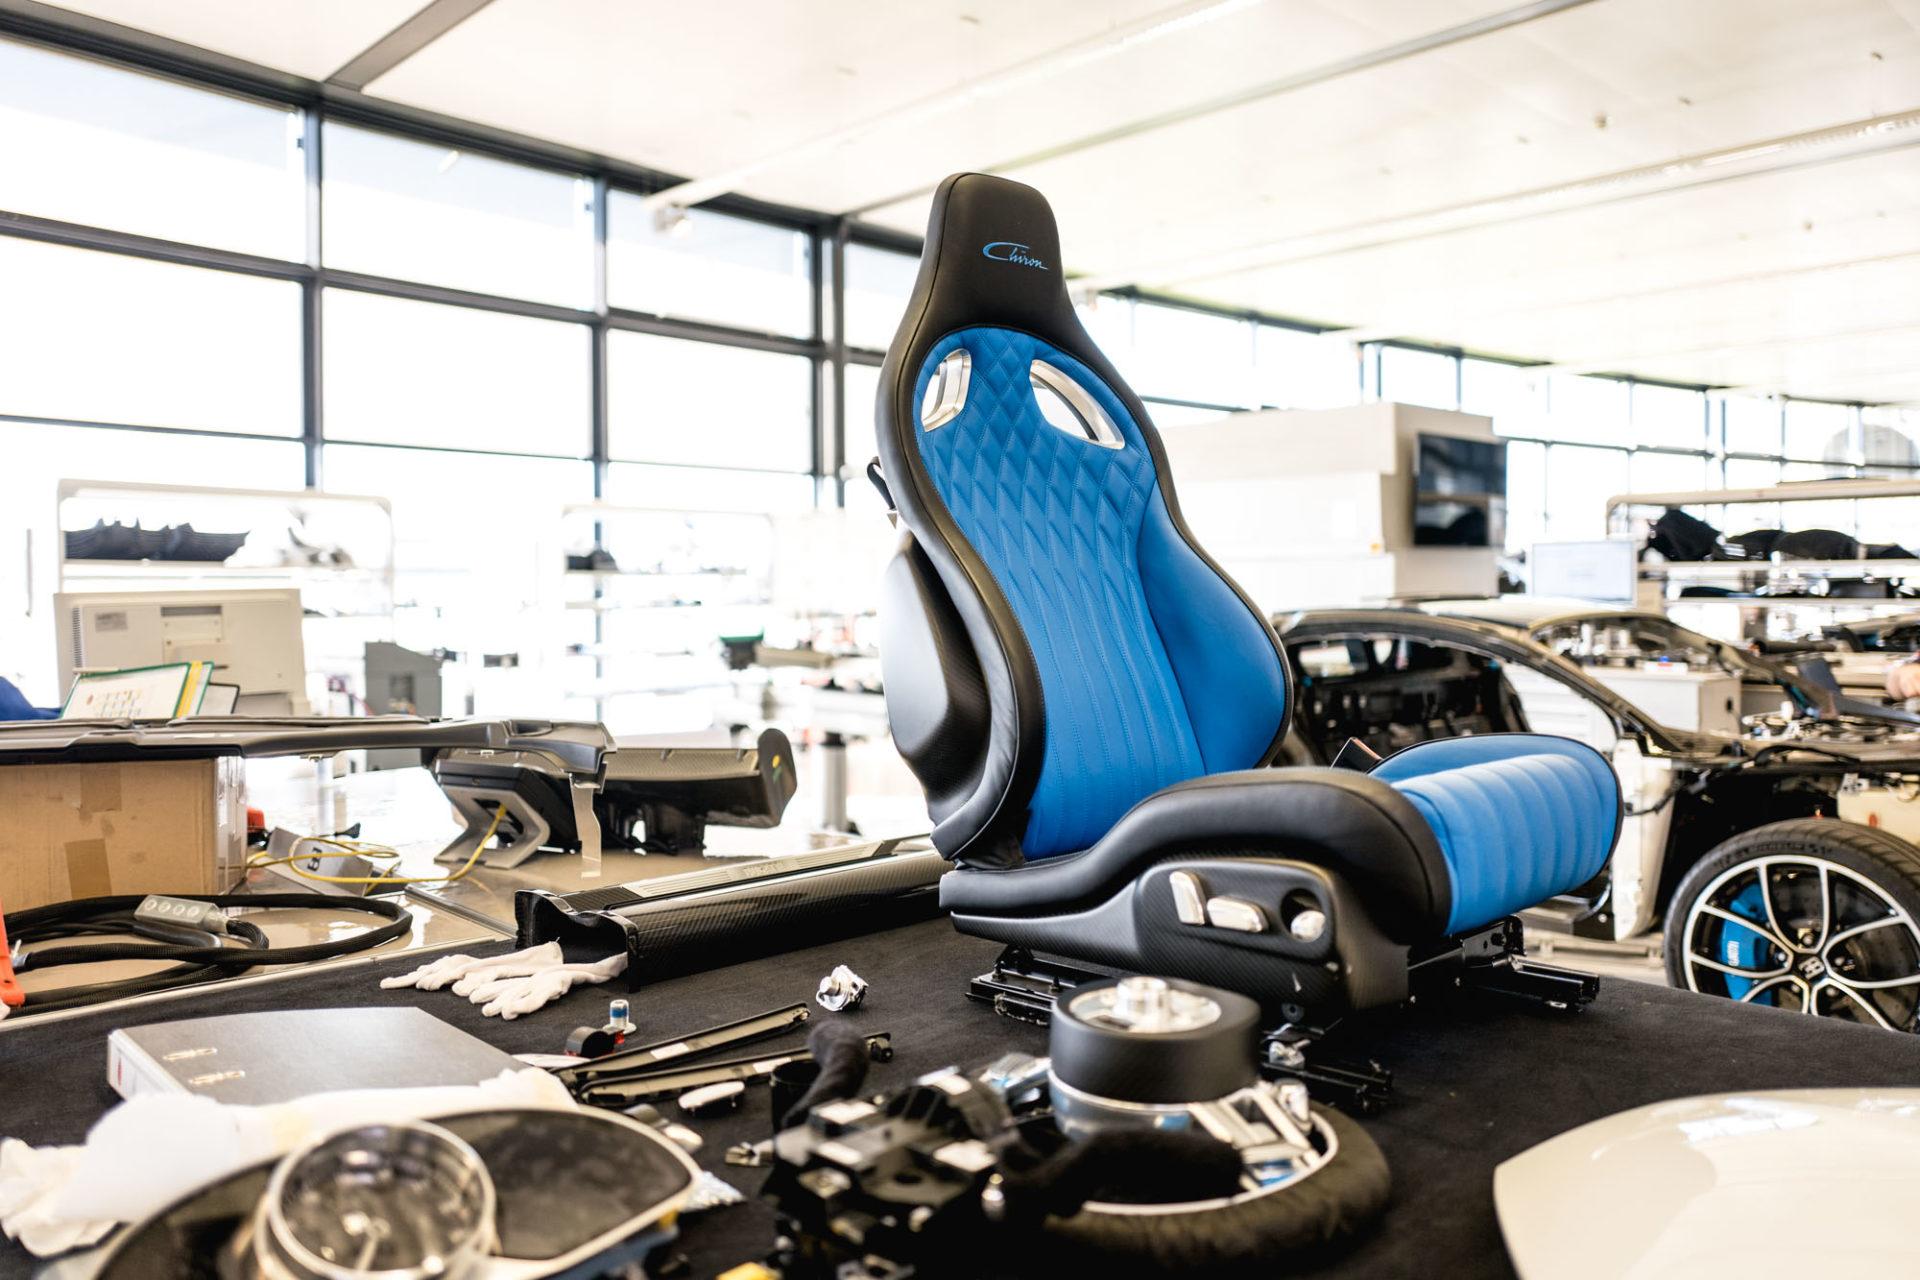 Ateliers Bugatti à Molsheim - Habillage intérieur